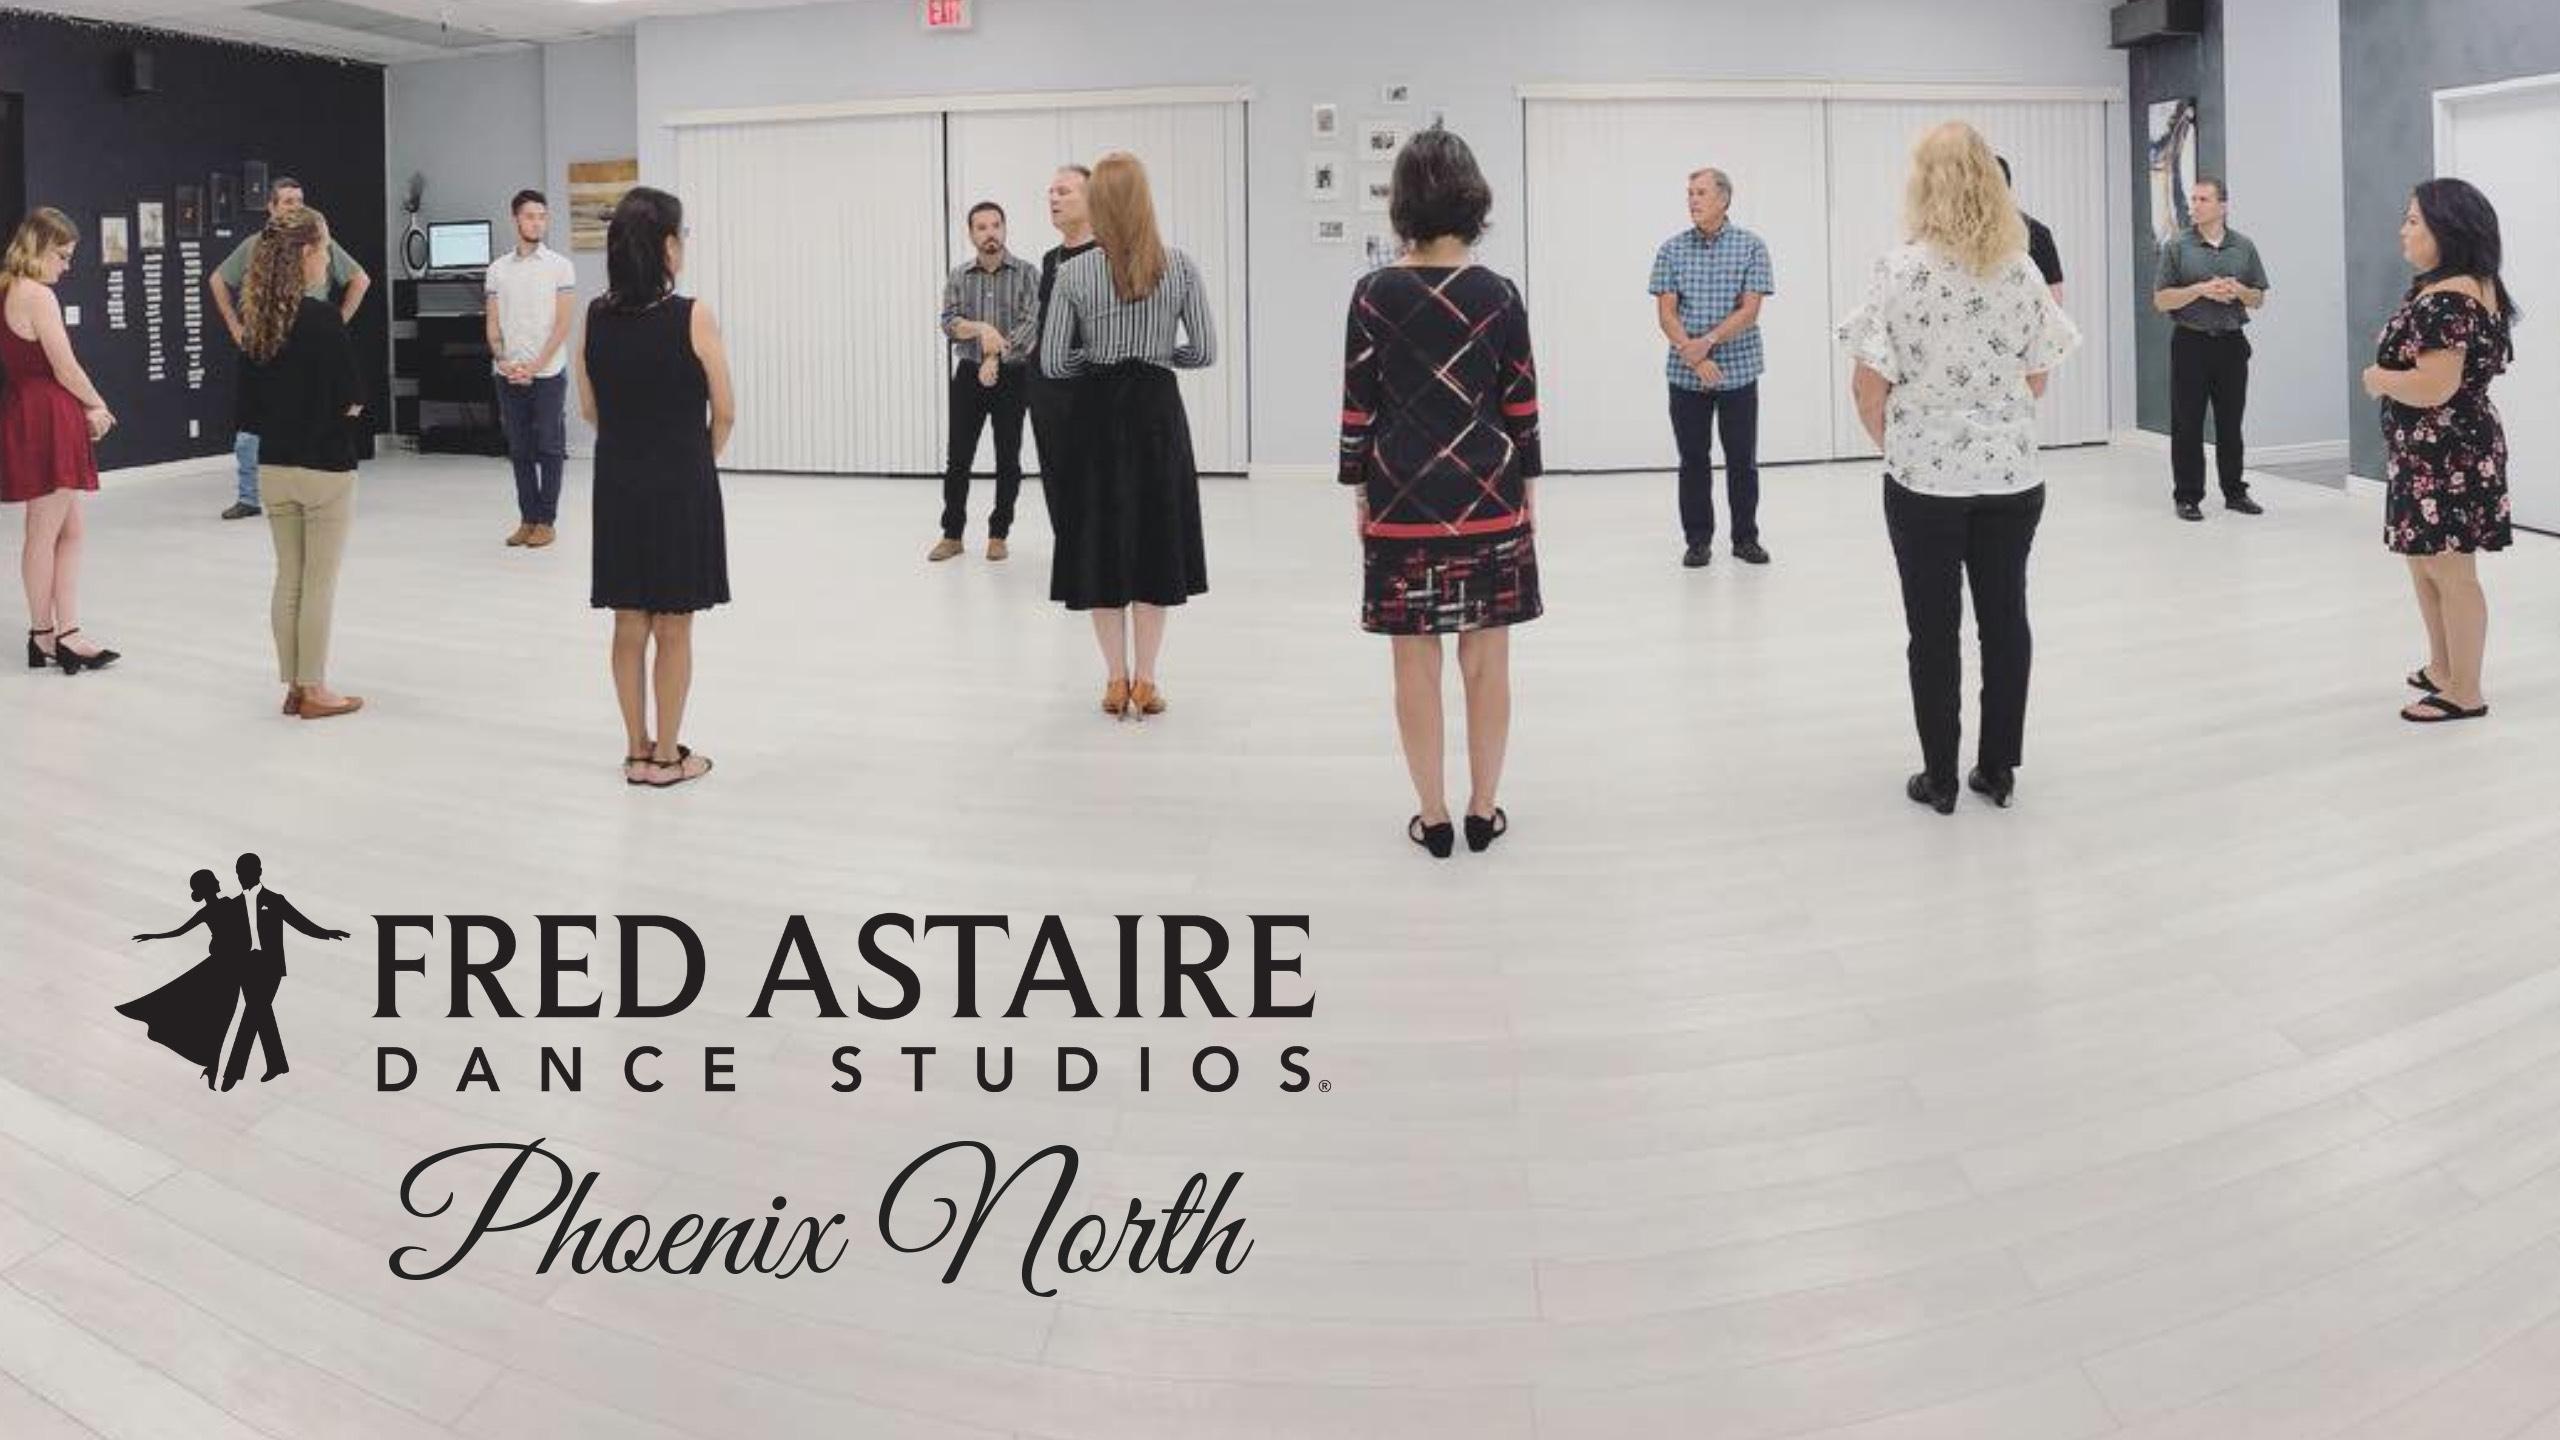 Arizona's Top Rated Local® Dance Schools and Studios Award Winner: Fred Astaire Dance Studio of Phoenix North